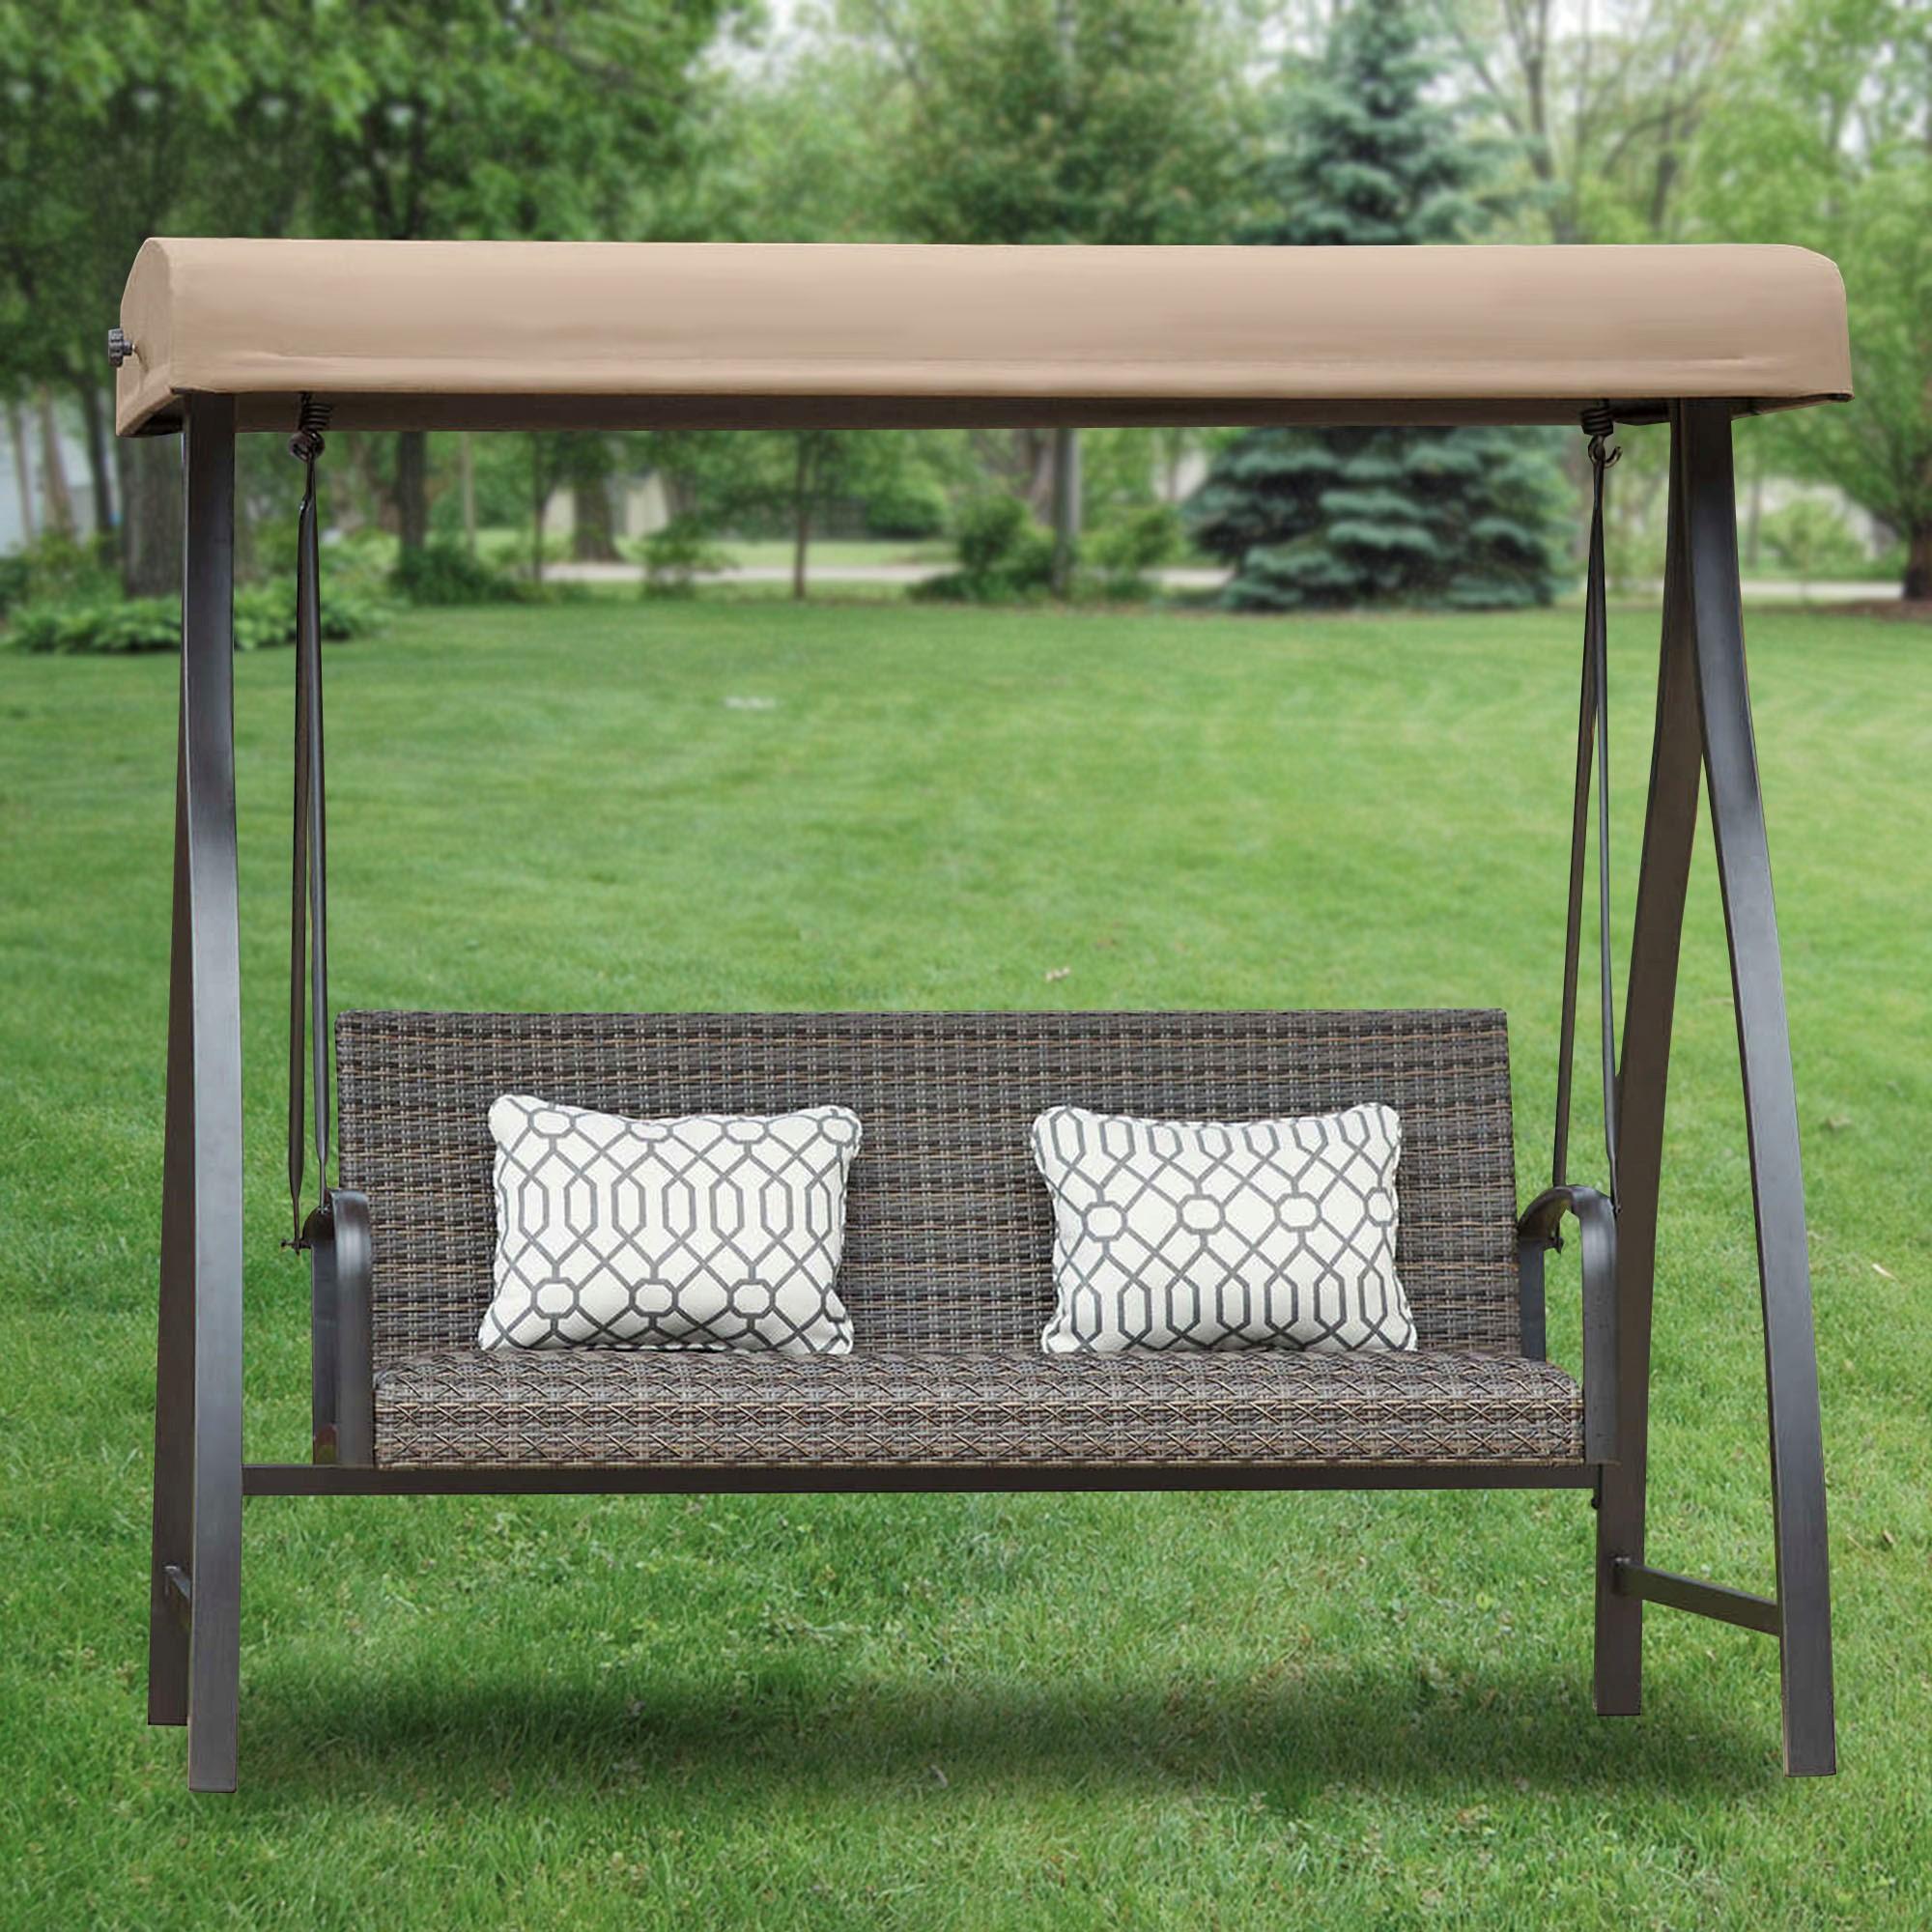 Replacement Canopy For Costco Eastport Swing Riplock 500 Garden Winds Canada